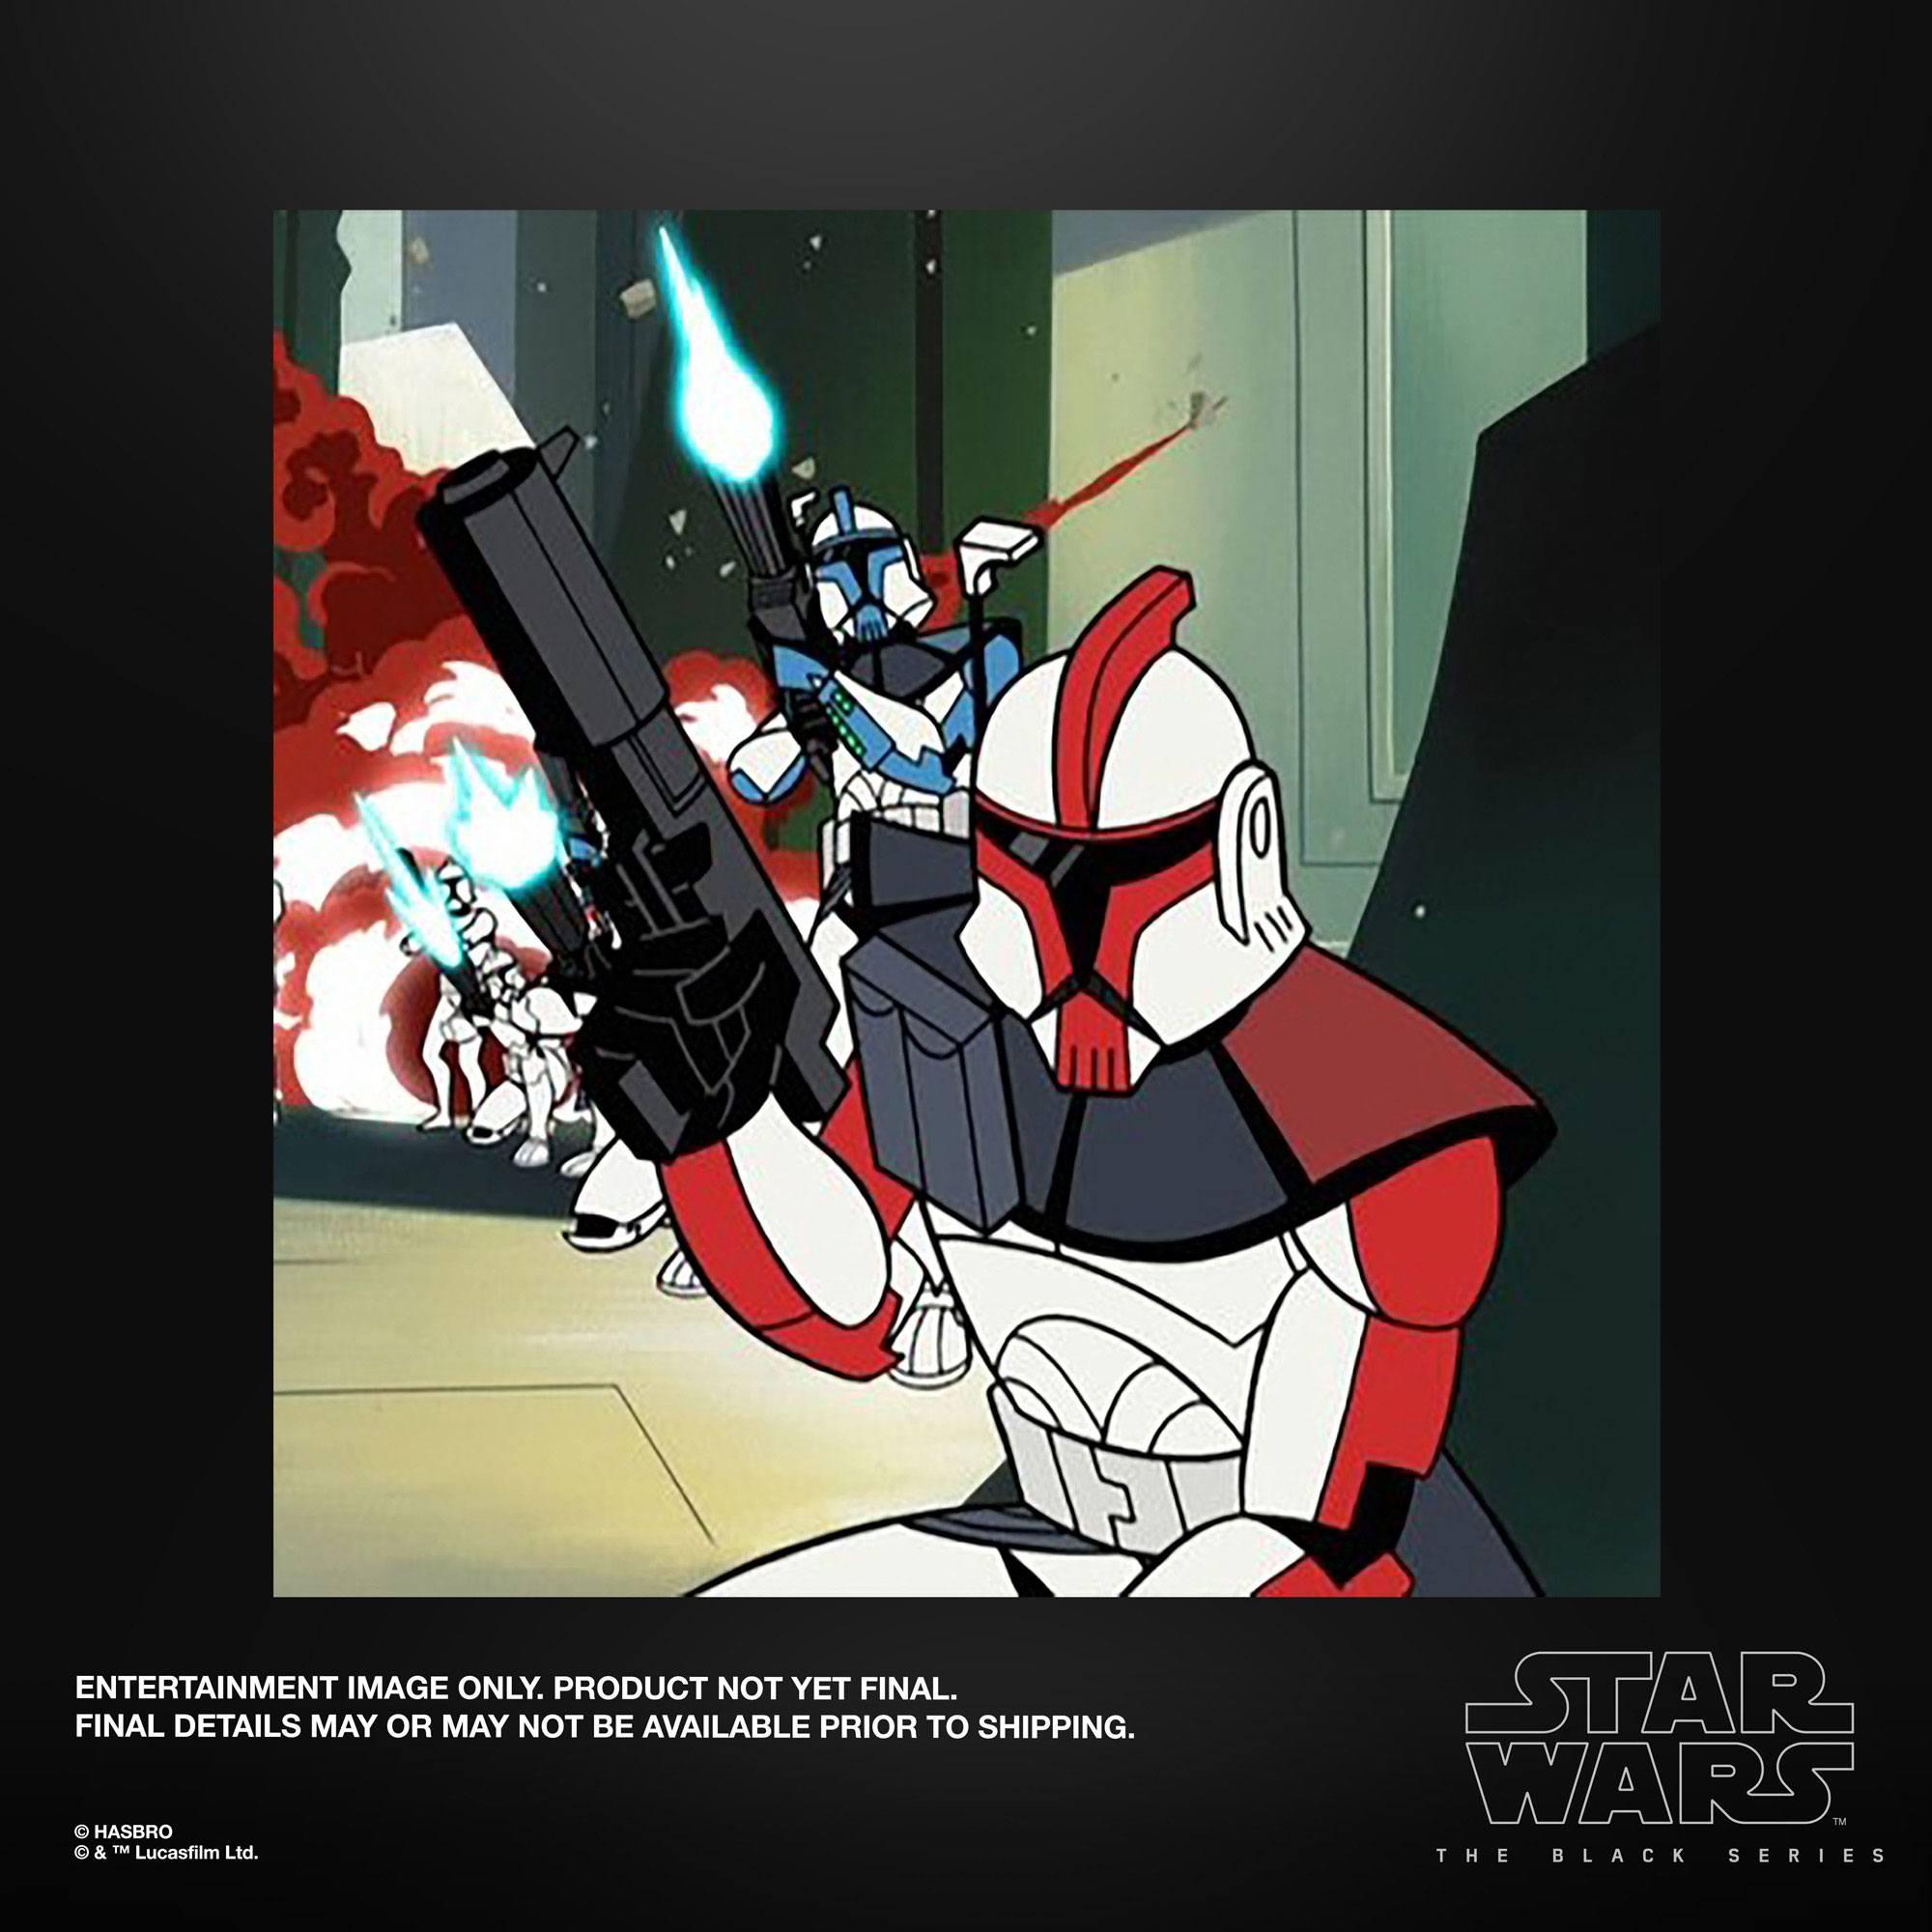 Star Wars The Clone Wars Black Series Actionfigur 2022 ARC Trooper 15 cm F52995L00 5010993949397